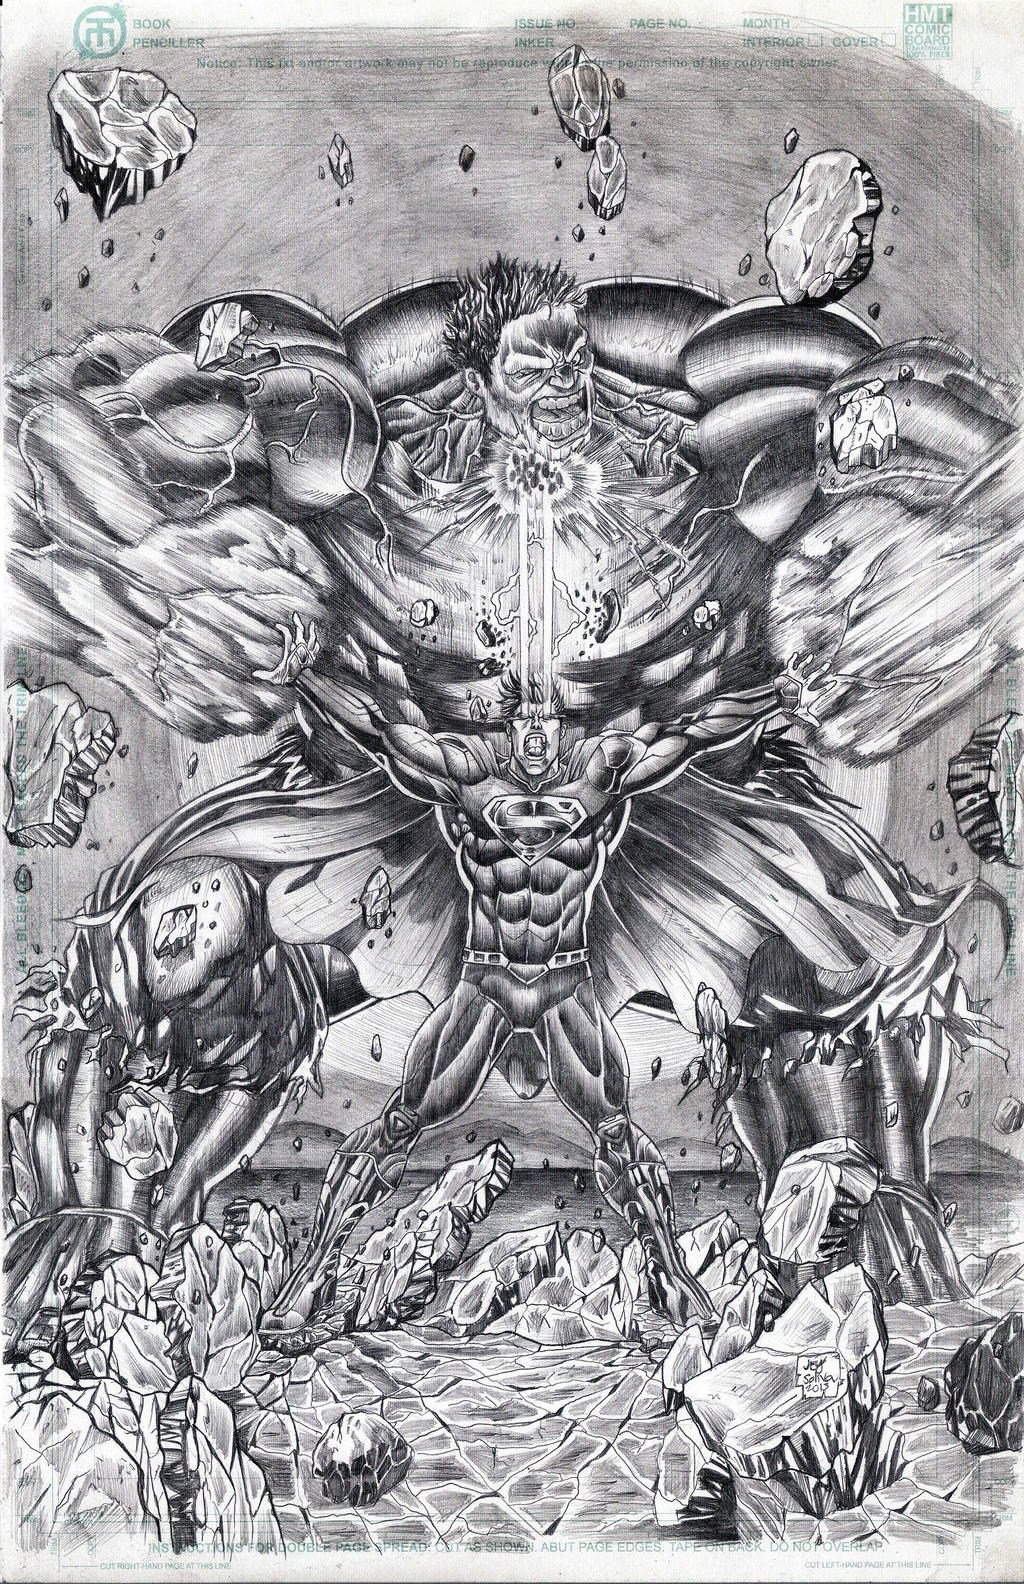 hulk vs superman coloring pages - photo#23